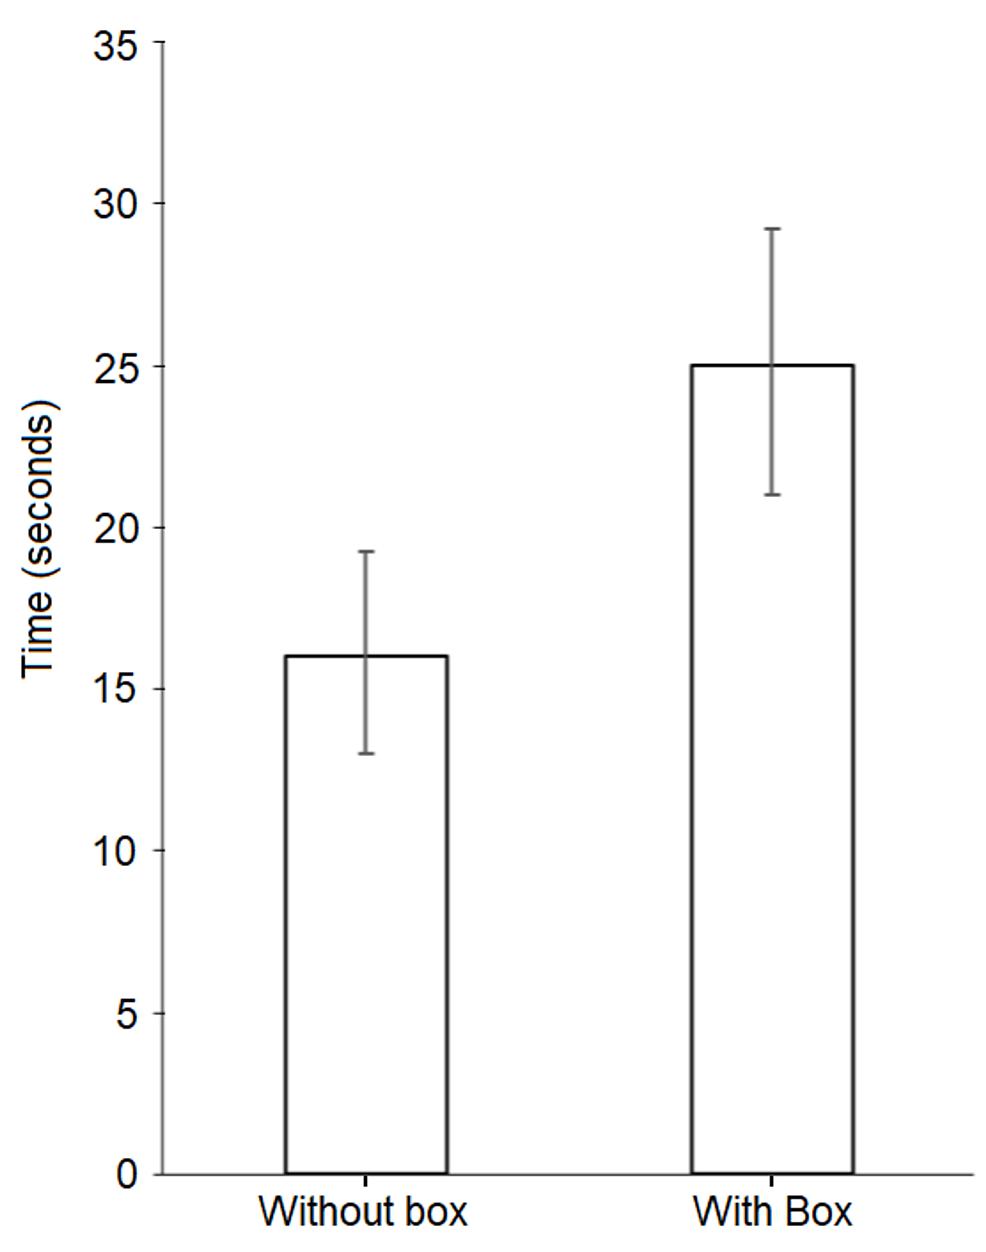 Column-chart-of-median-intubation-times